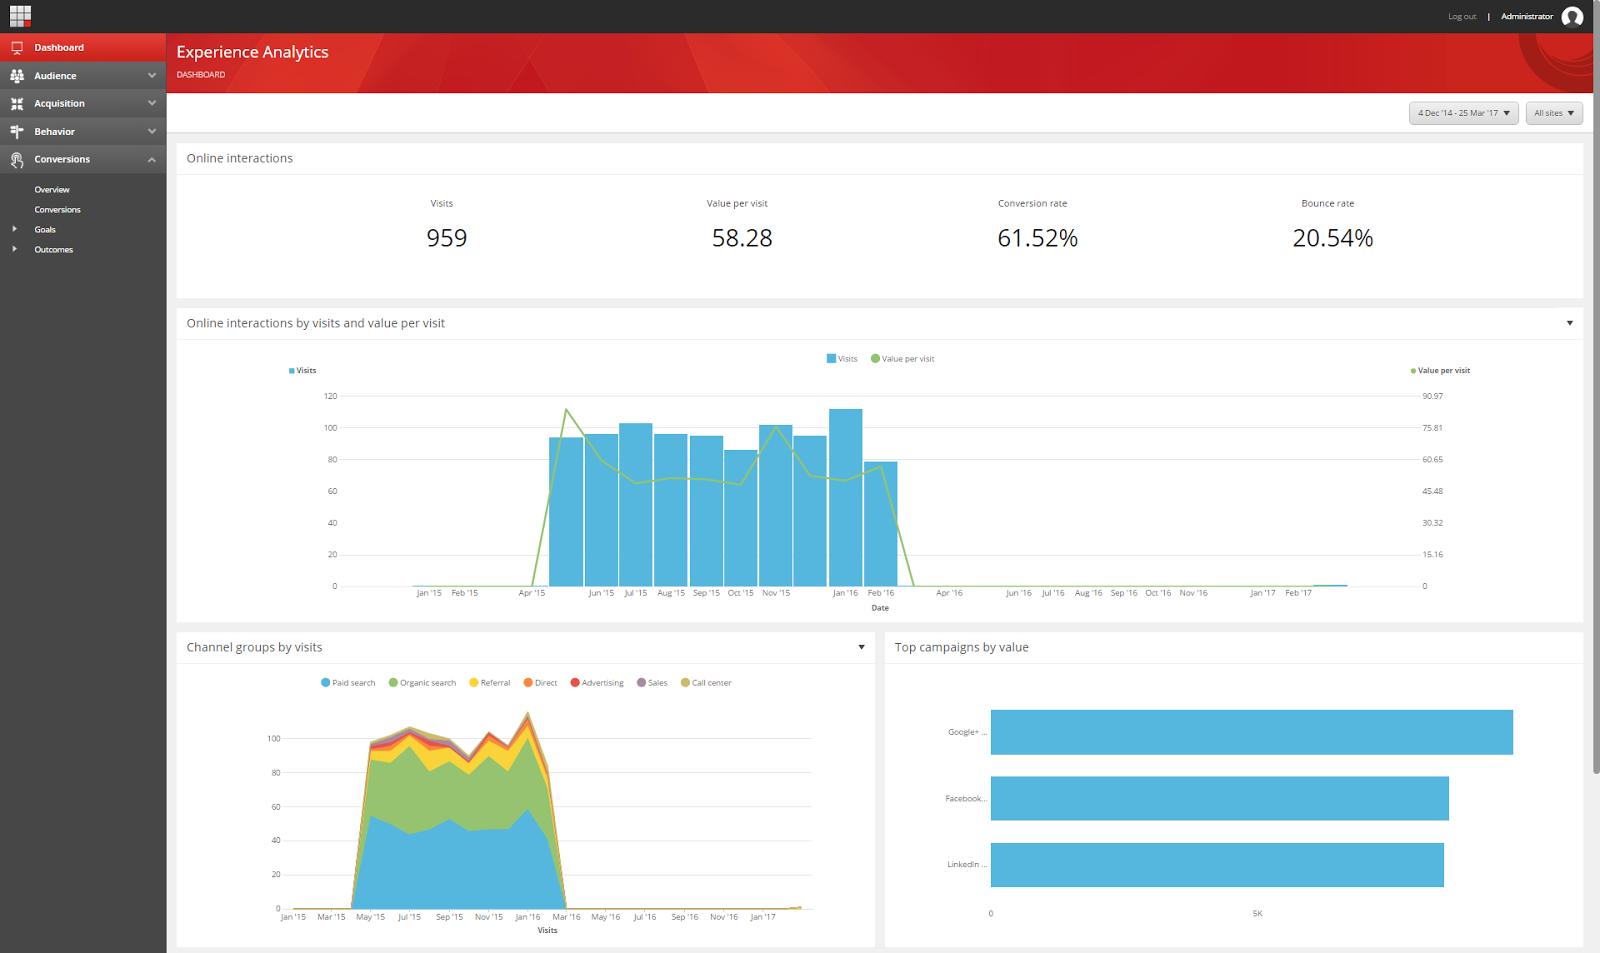 Sitecore's Experience Analytics dashboard